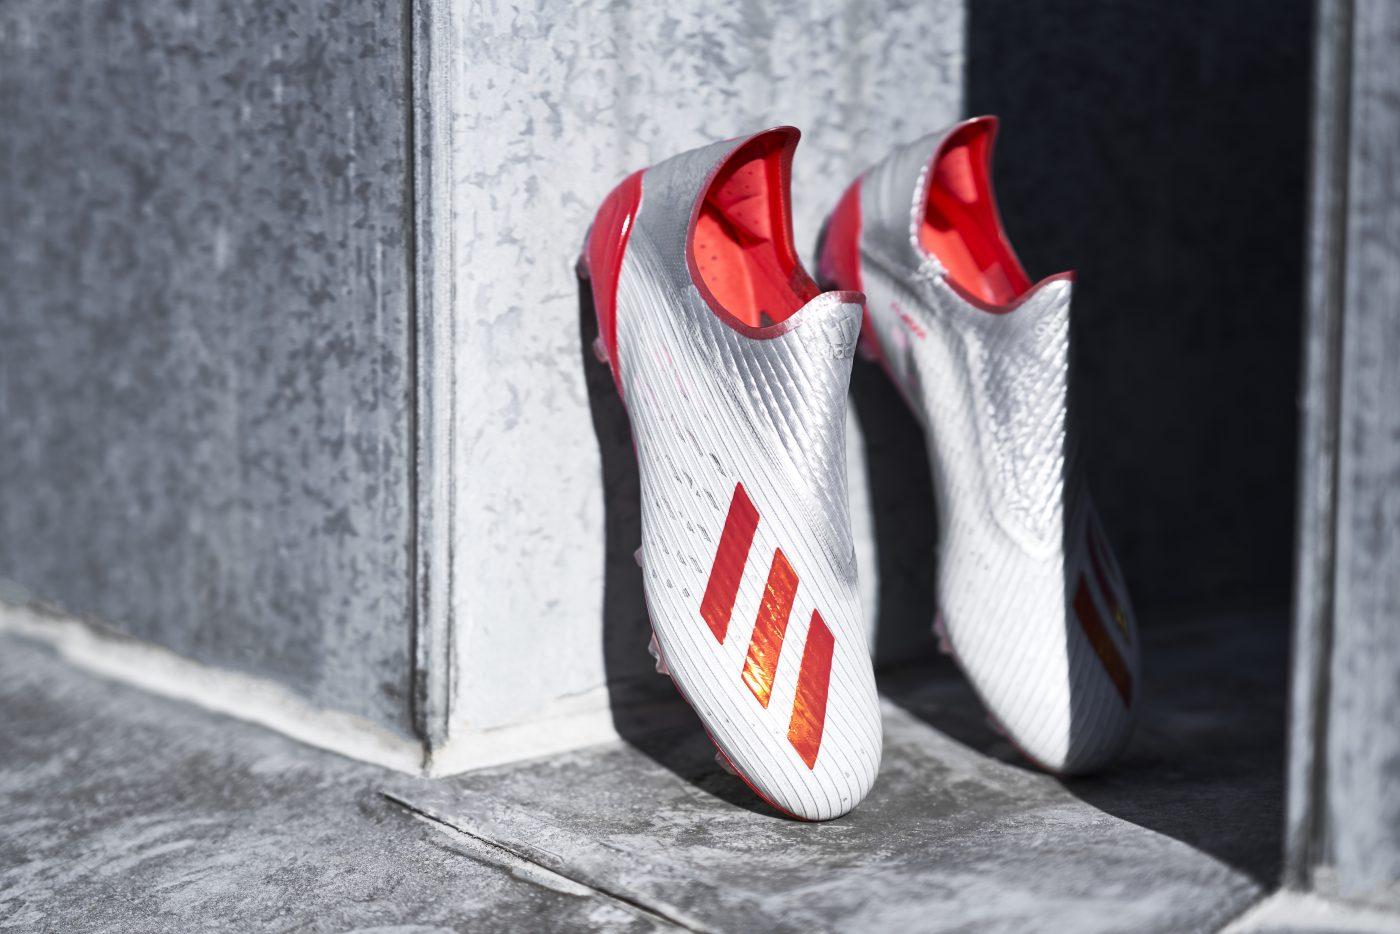 adidas-x-19-302-redirect-mai-2019-1